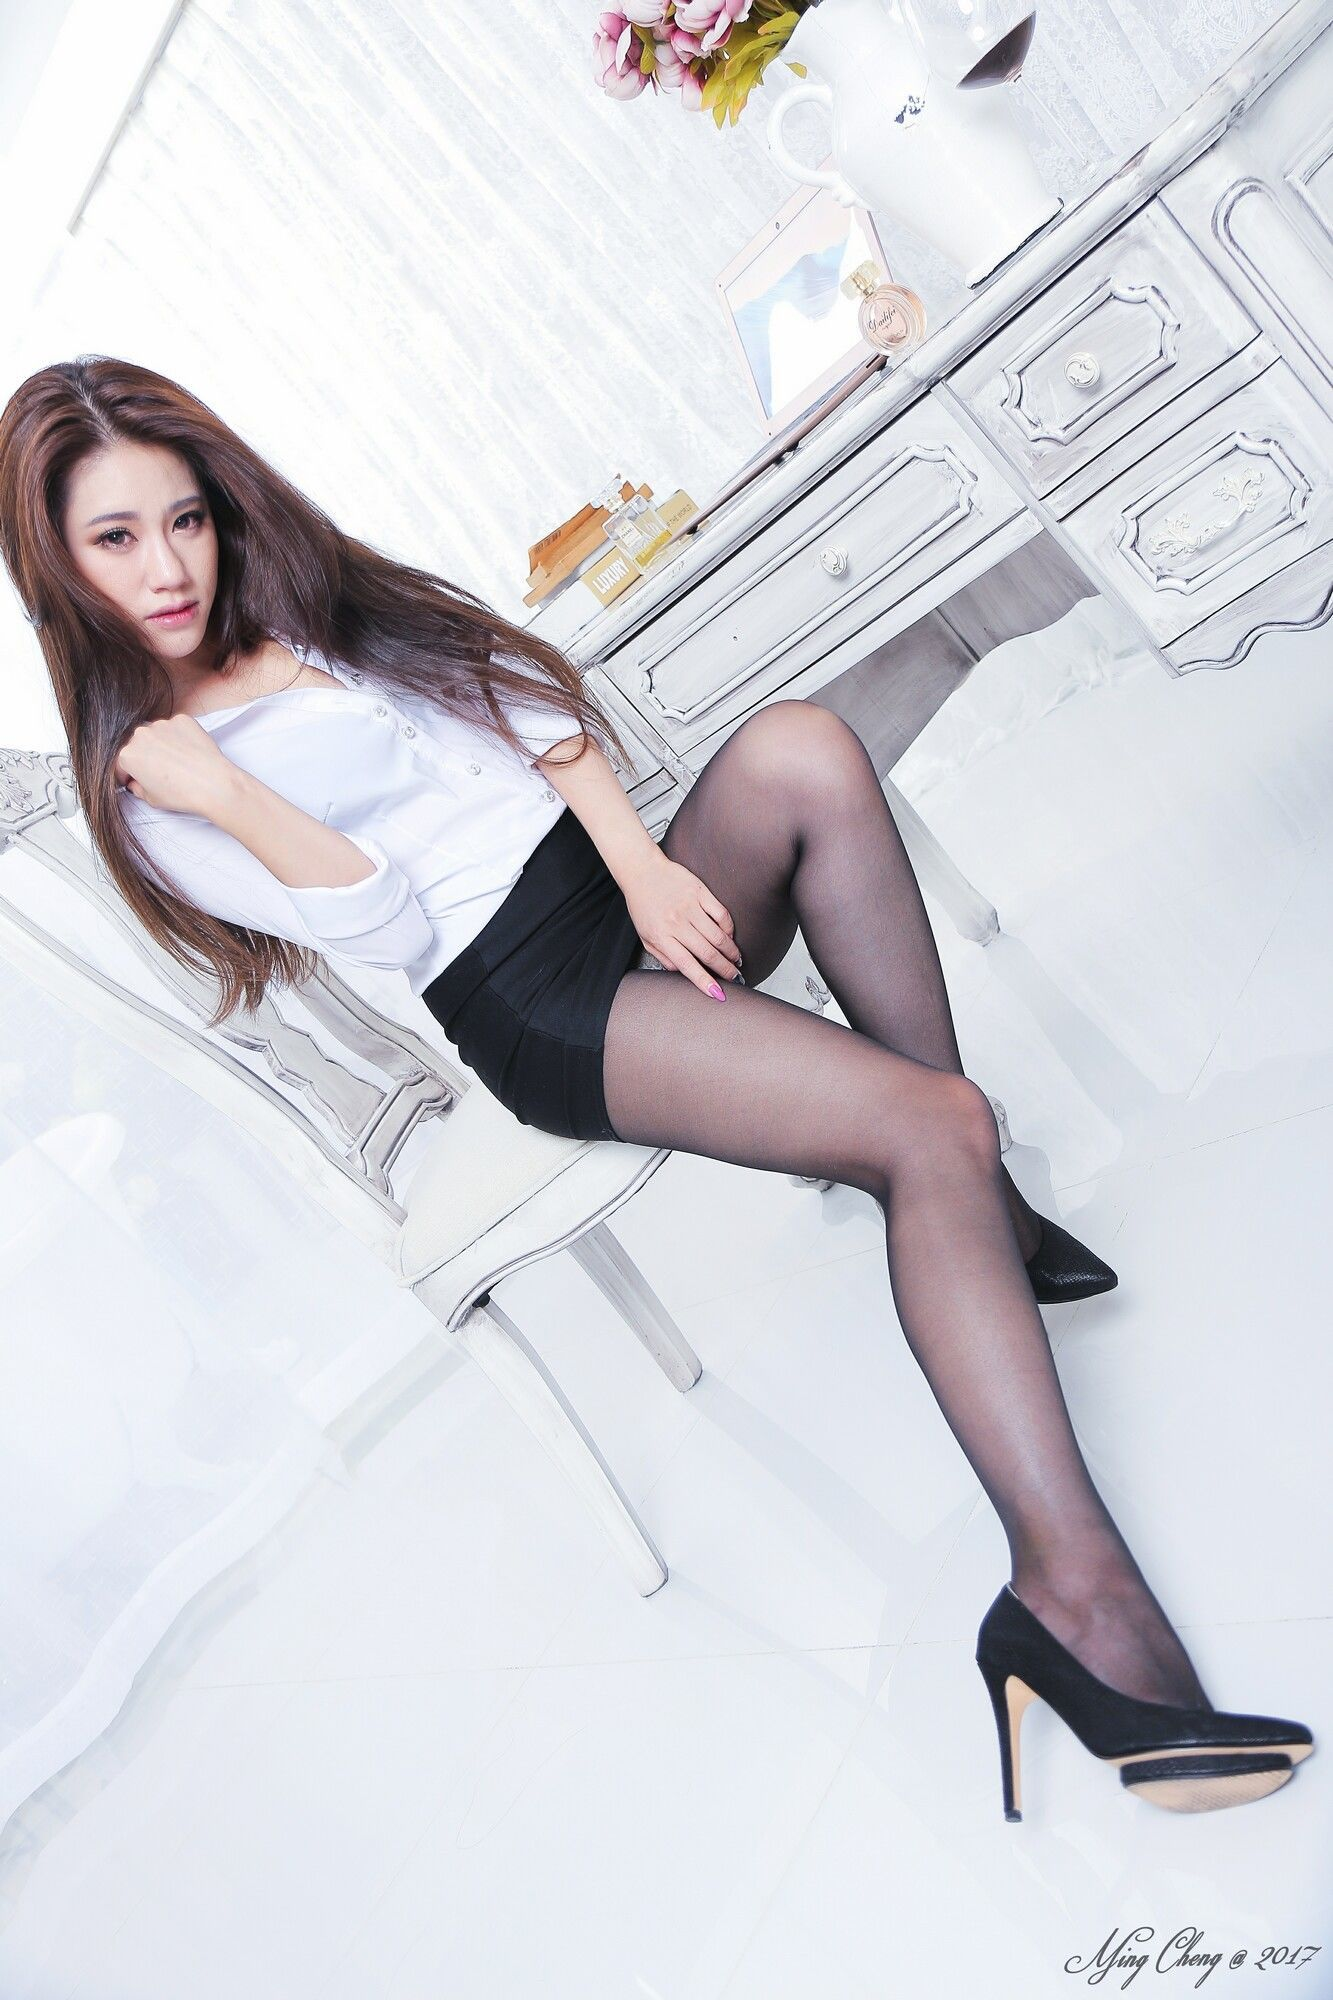 Silk stockings and high heels